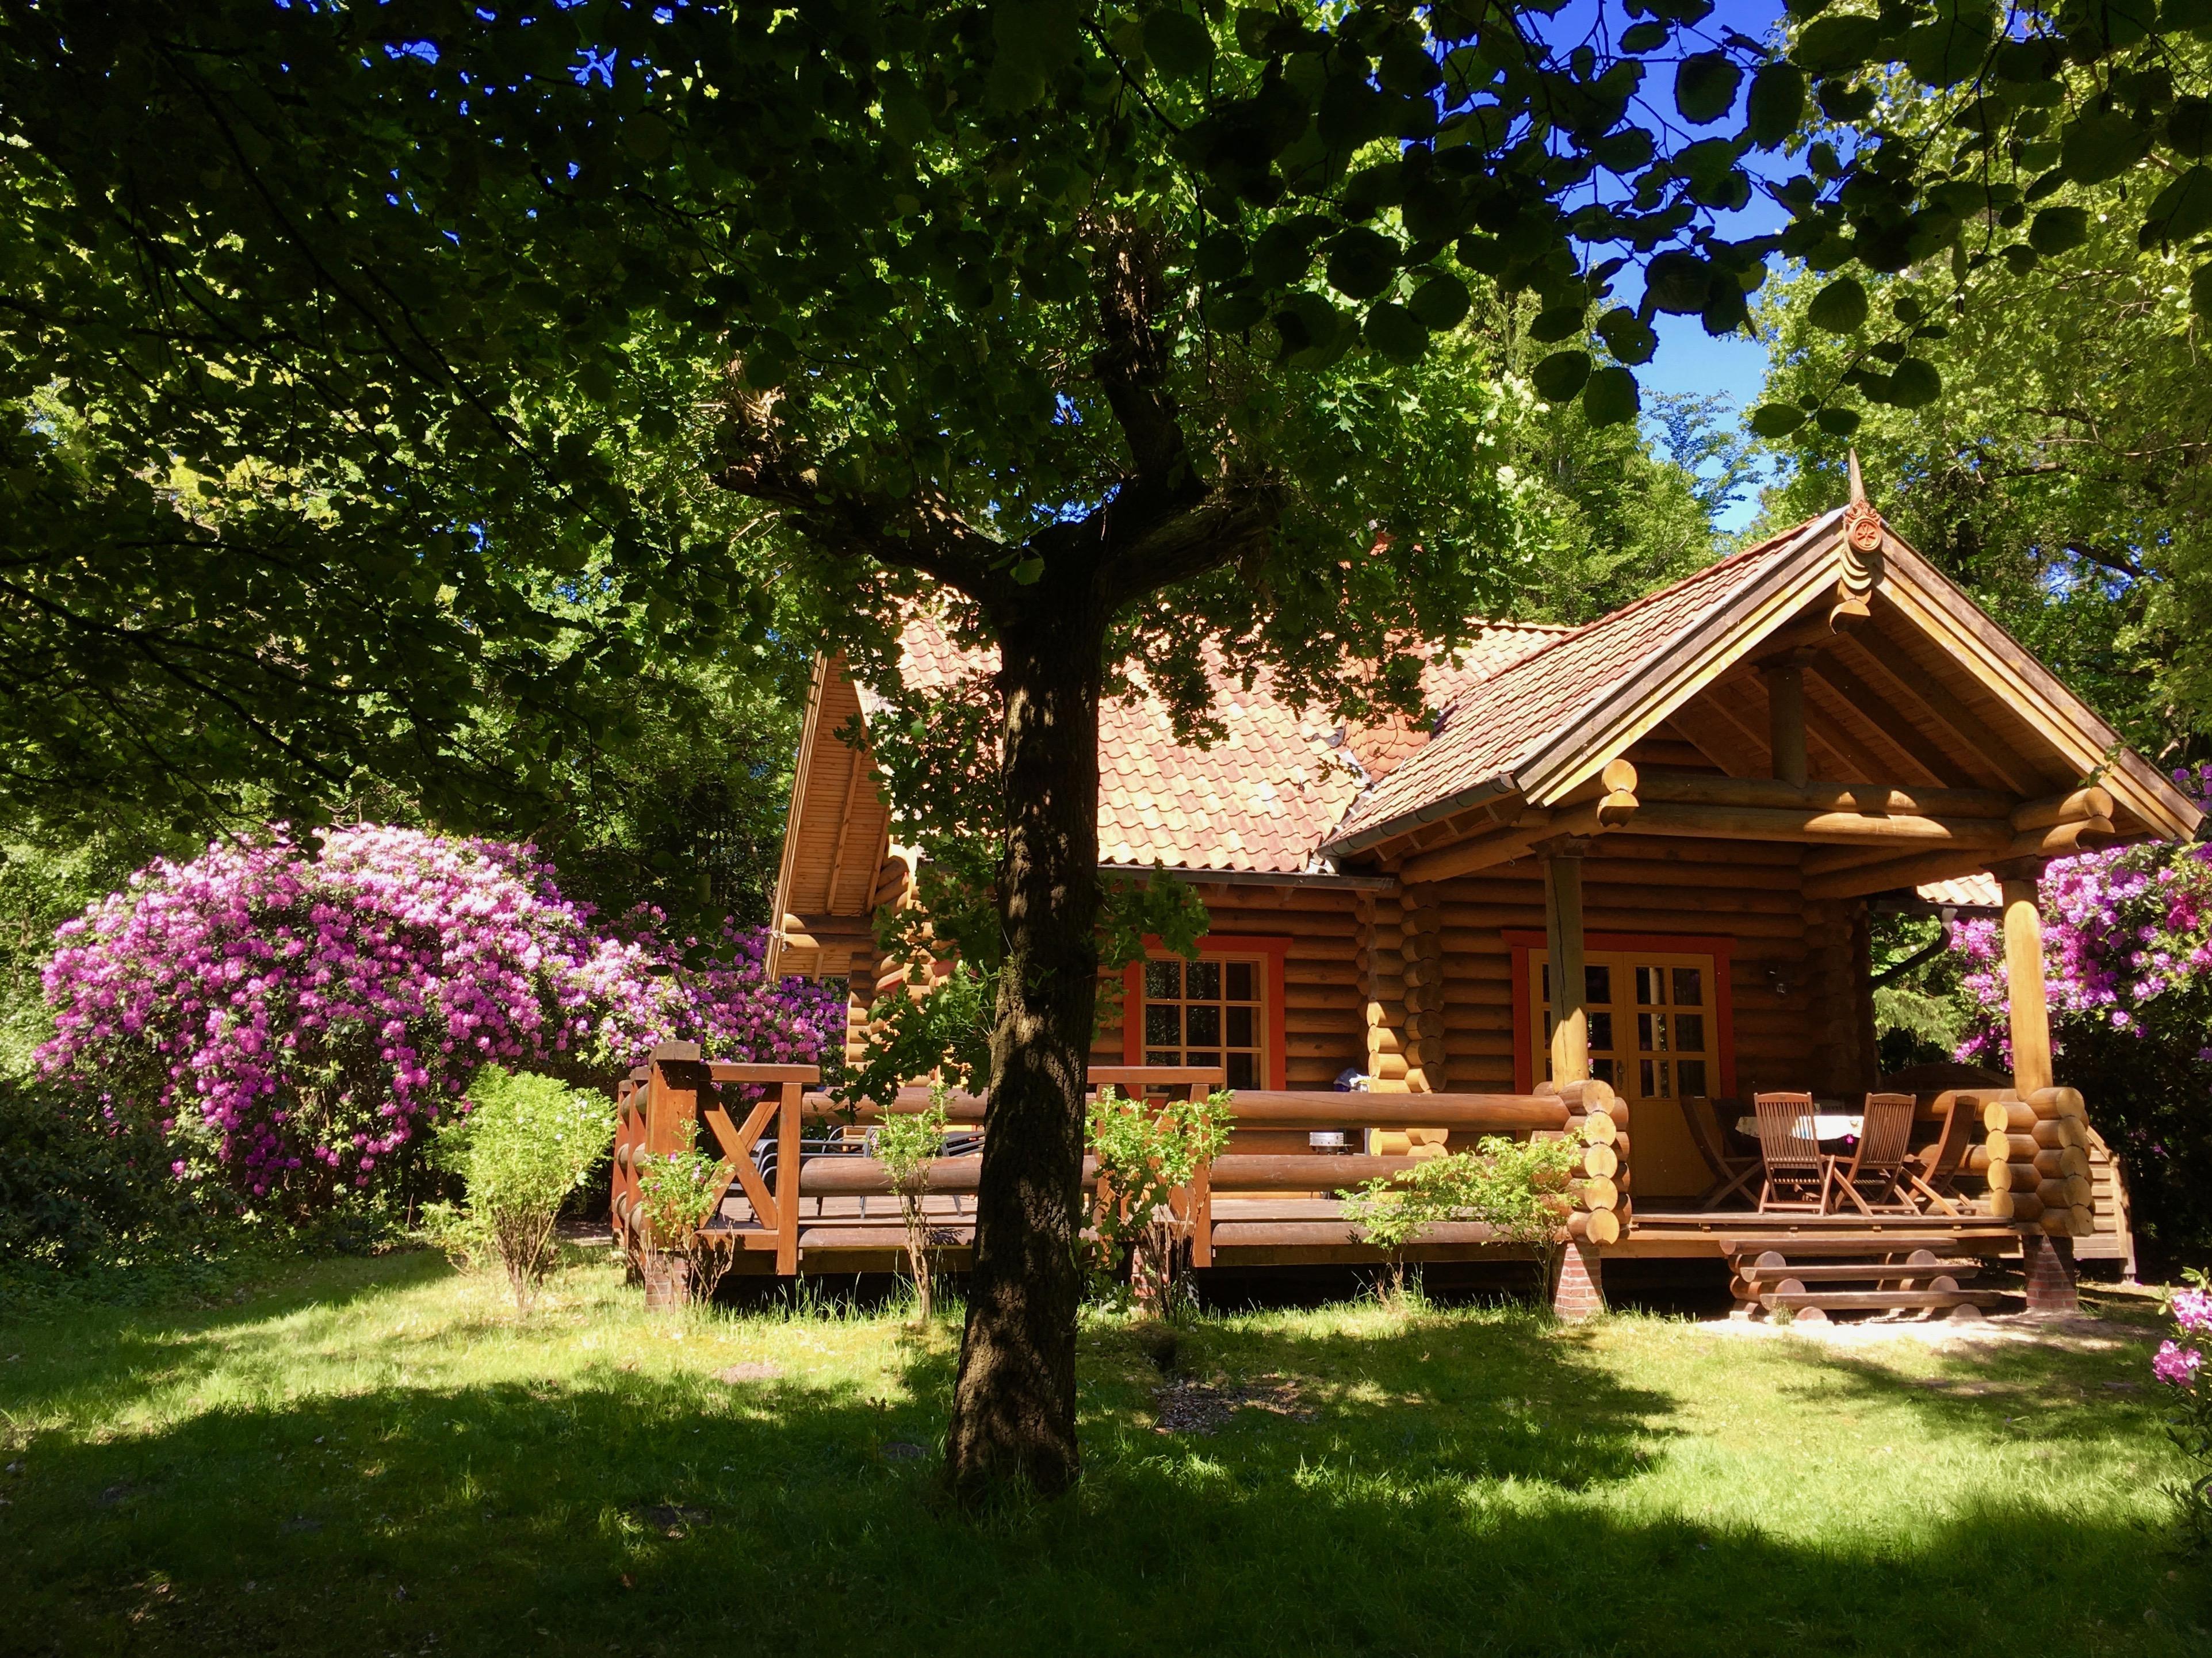 Rundbohlenblockhaus am Waldsee